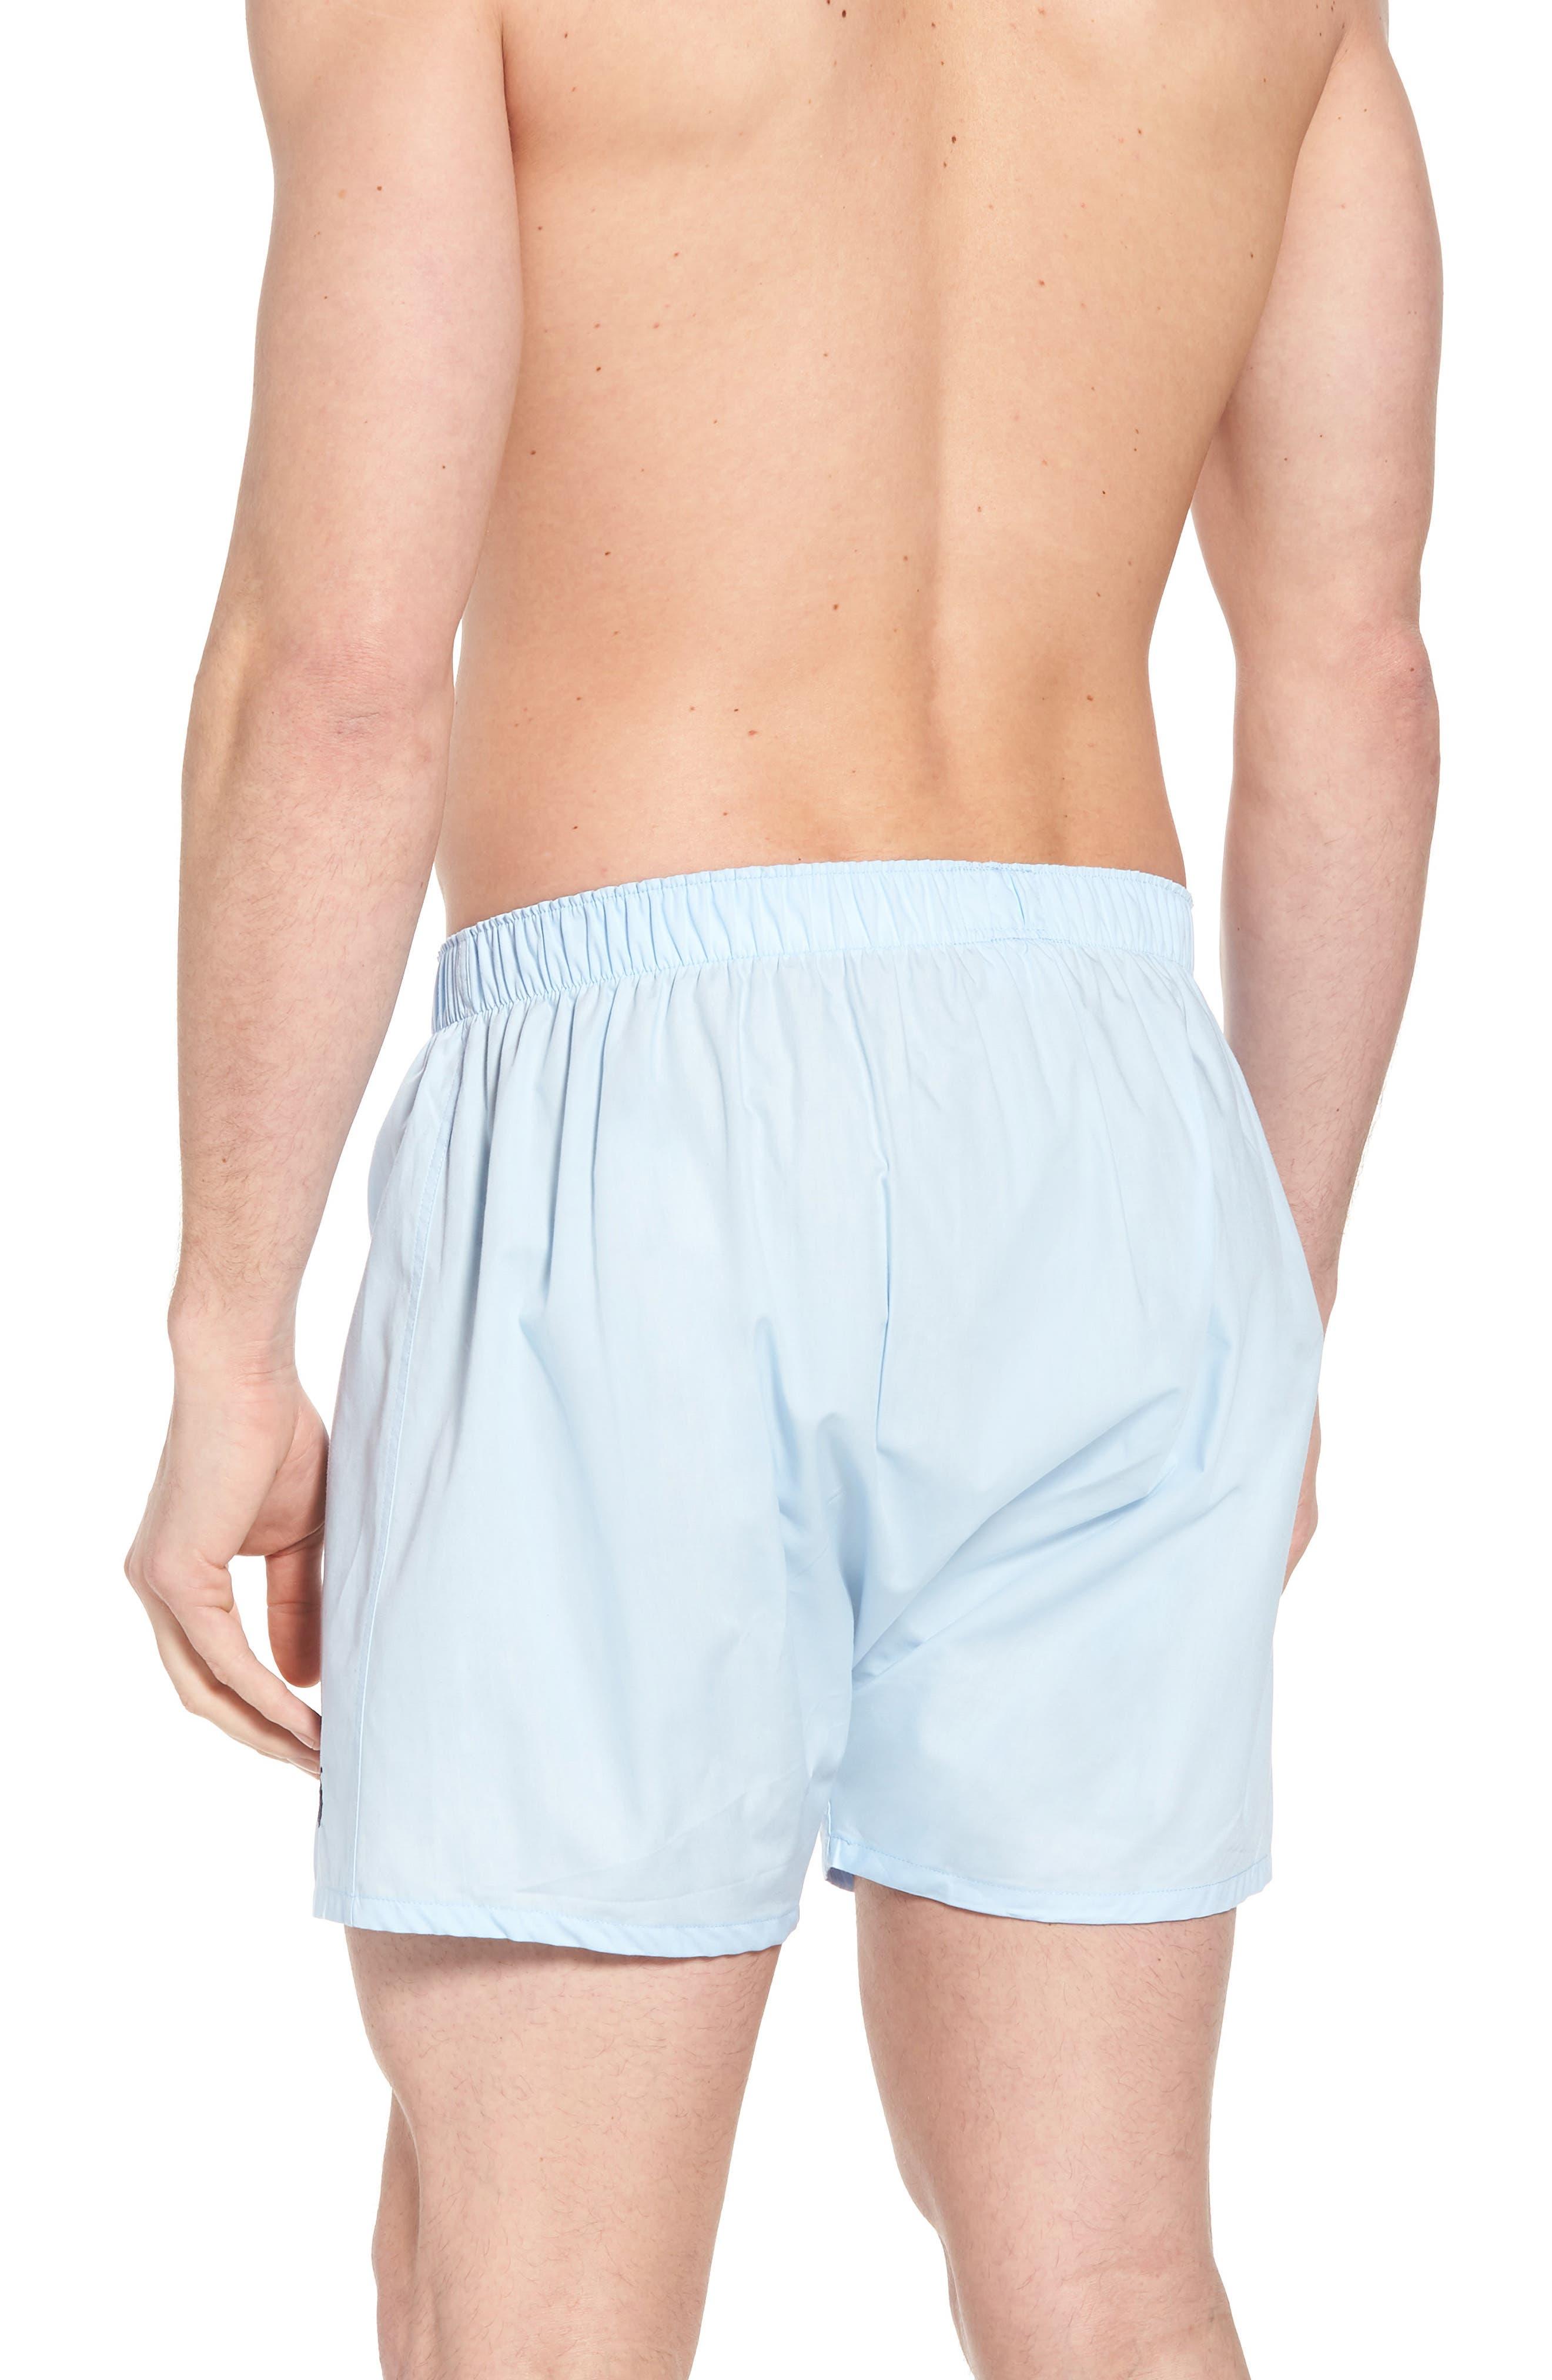 3-Pack Cotton Boxers,                             Alternate thumbnail 3, color,                             WHITE/ LIGHT BLUE/ CRUISE NAVY